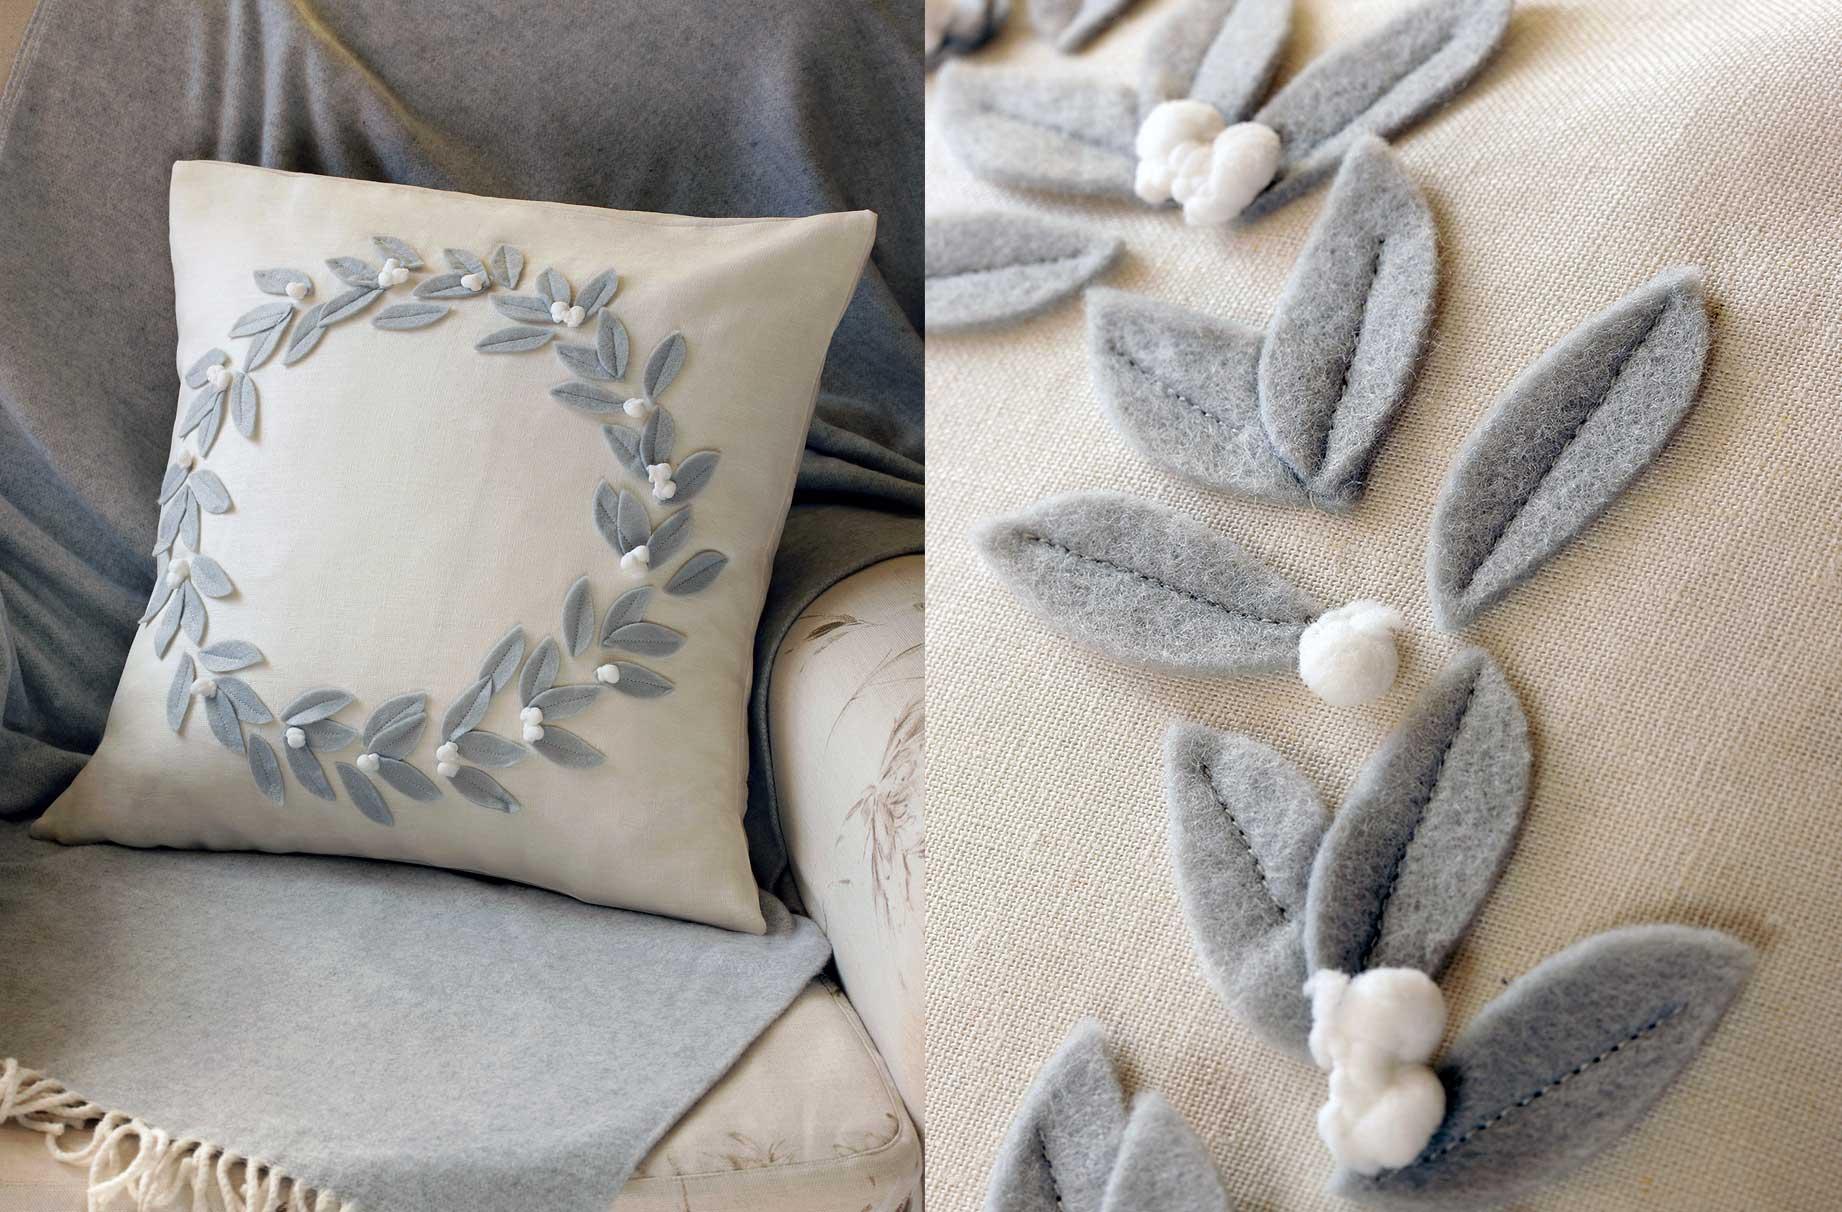 How to make a Christmas wreath cushion